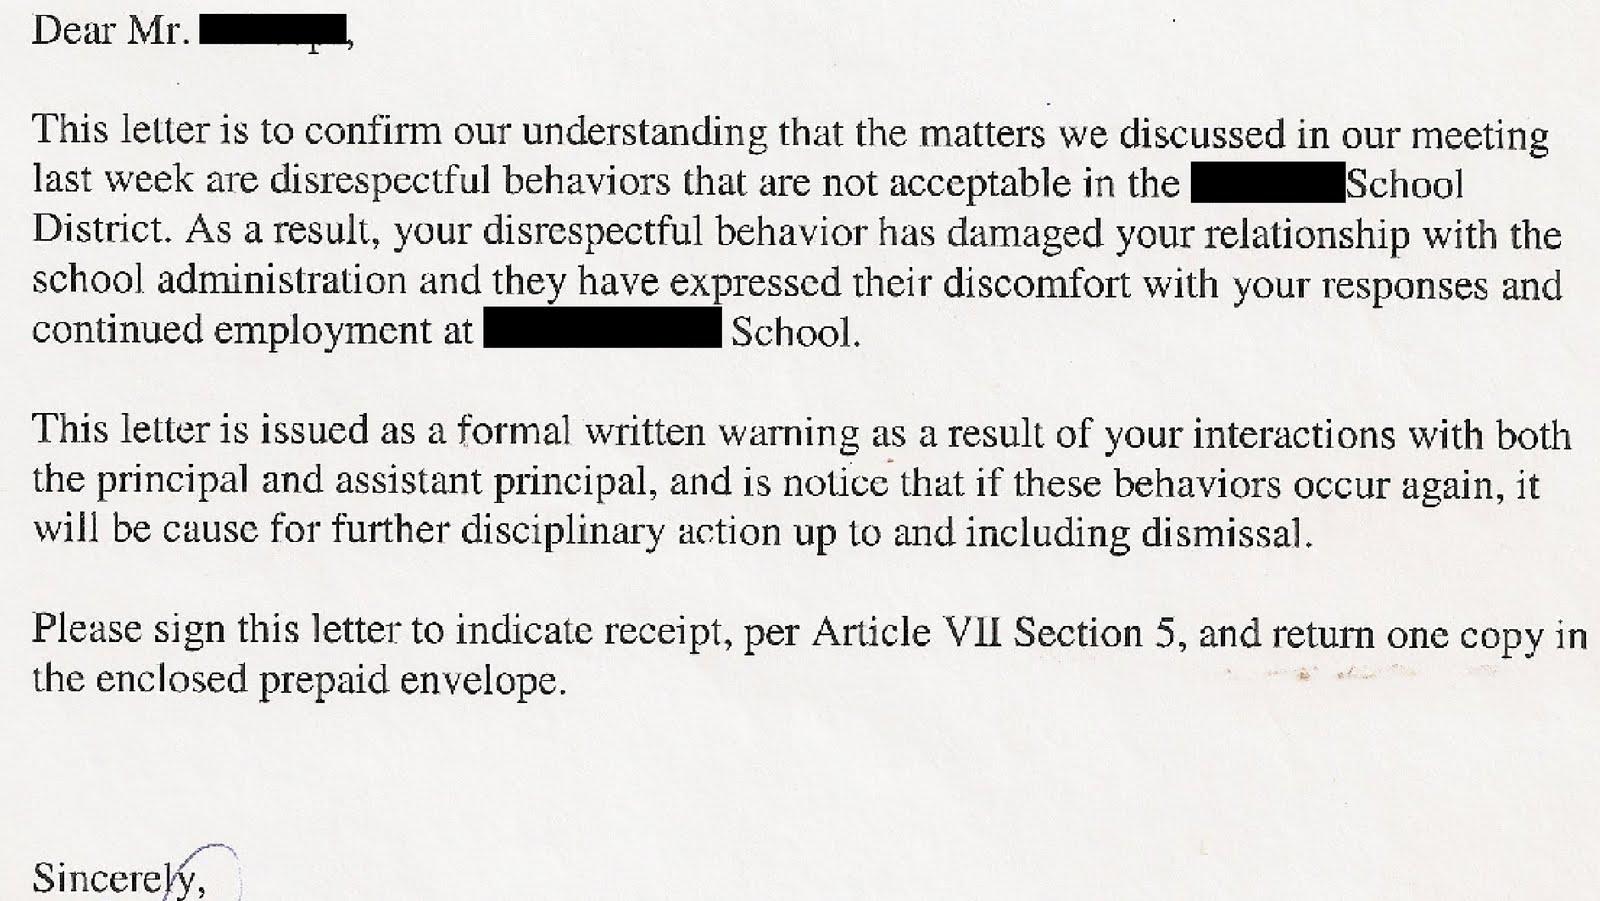 settlement letter after resignation resume samples settlement letter after resignation full and final settlement letter after resignation letter employer receive after sample